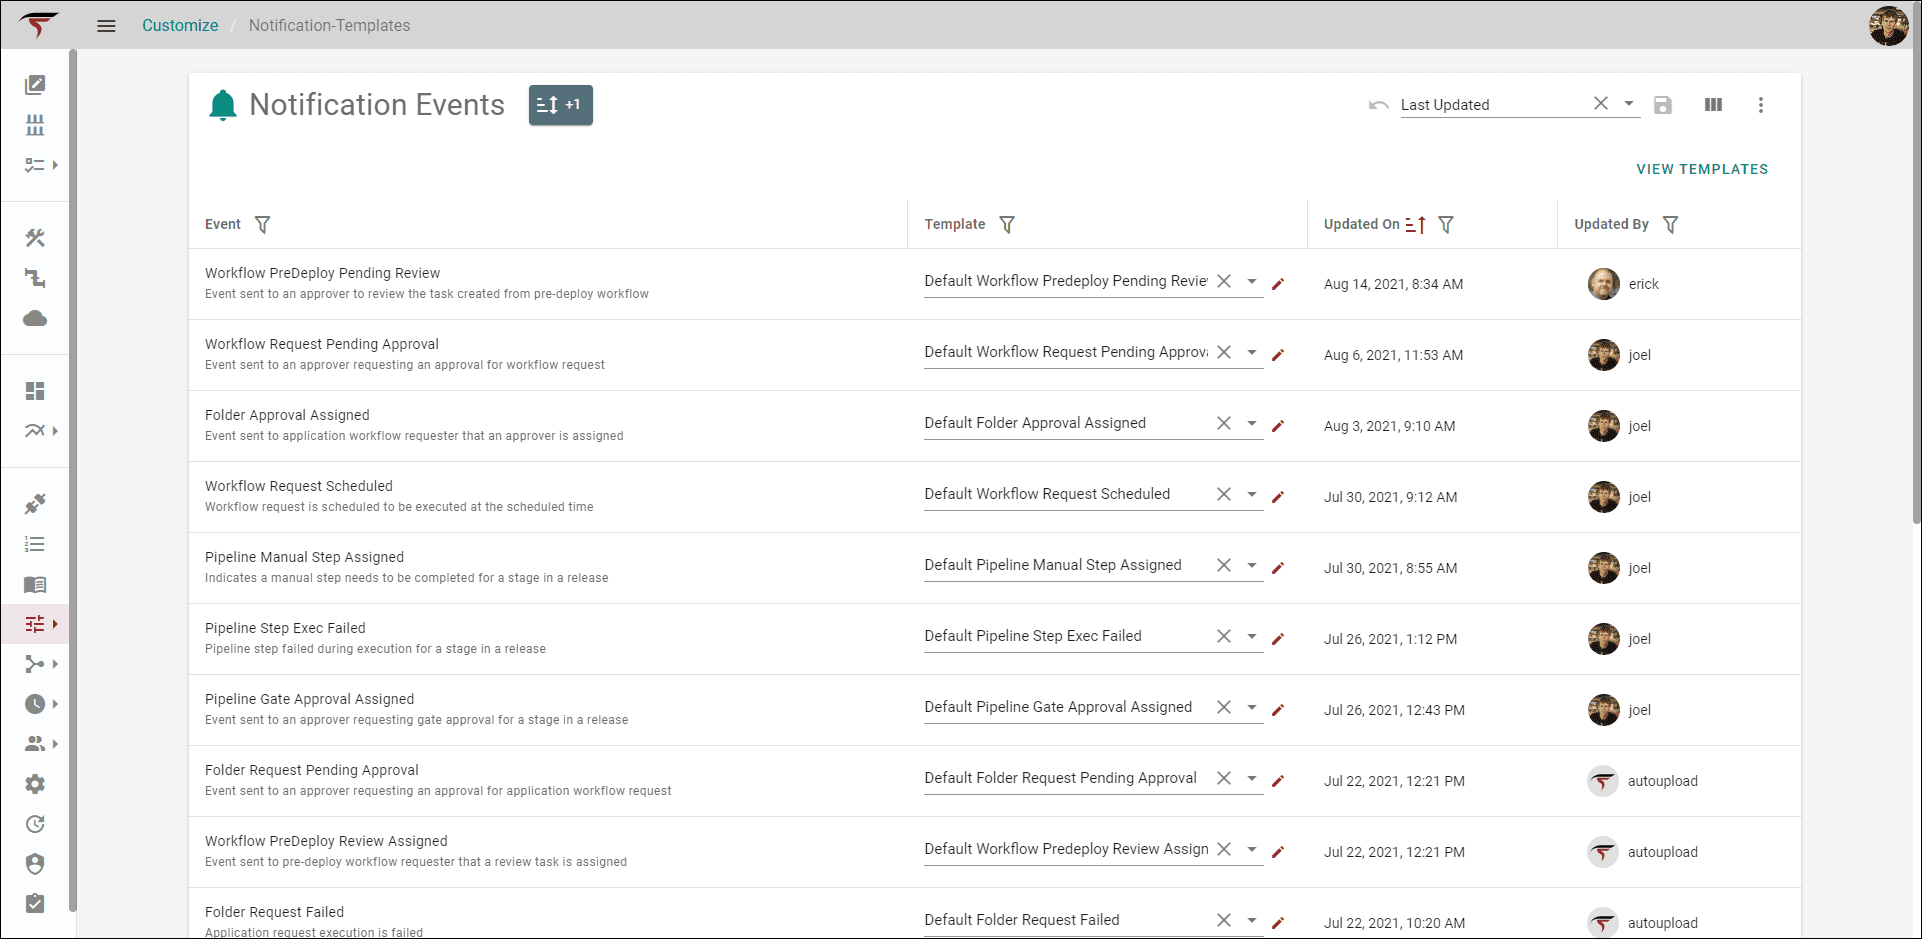 Notification Template List